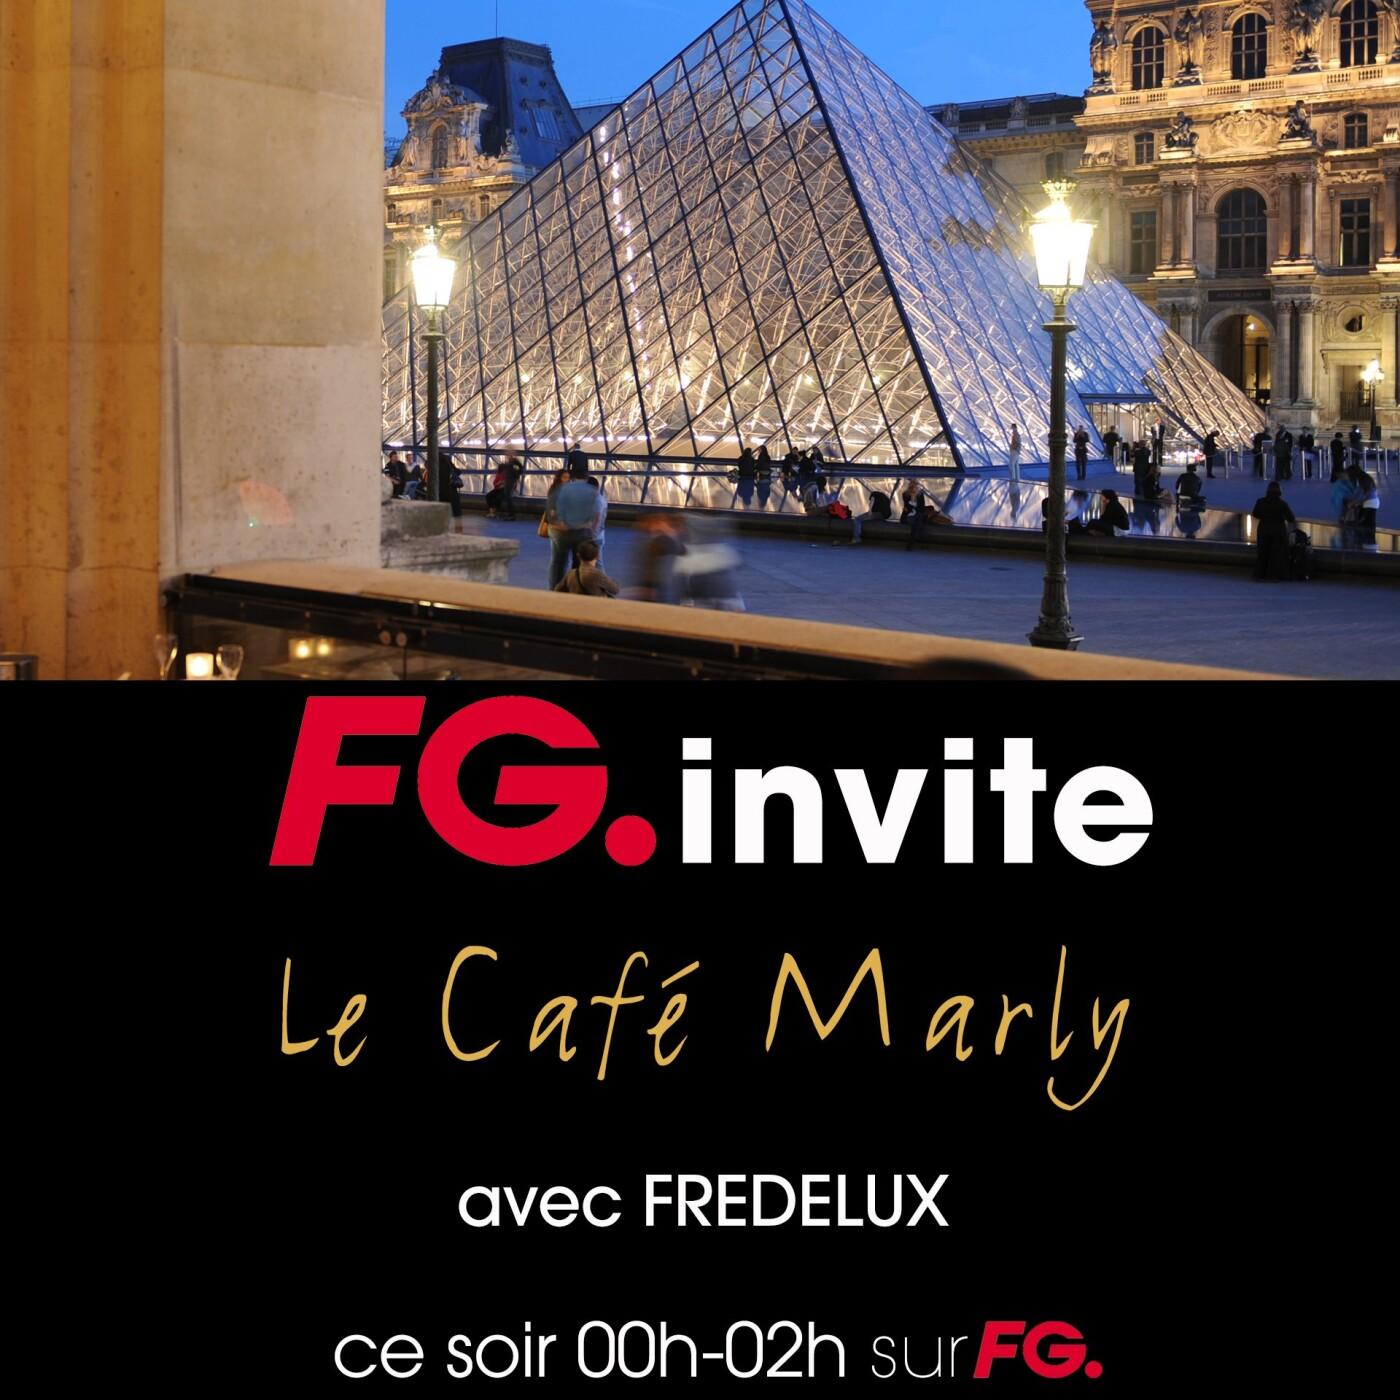 FG INVITE : LE CAFE MARLY